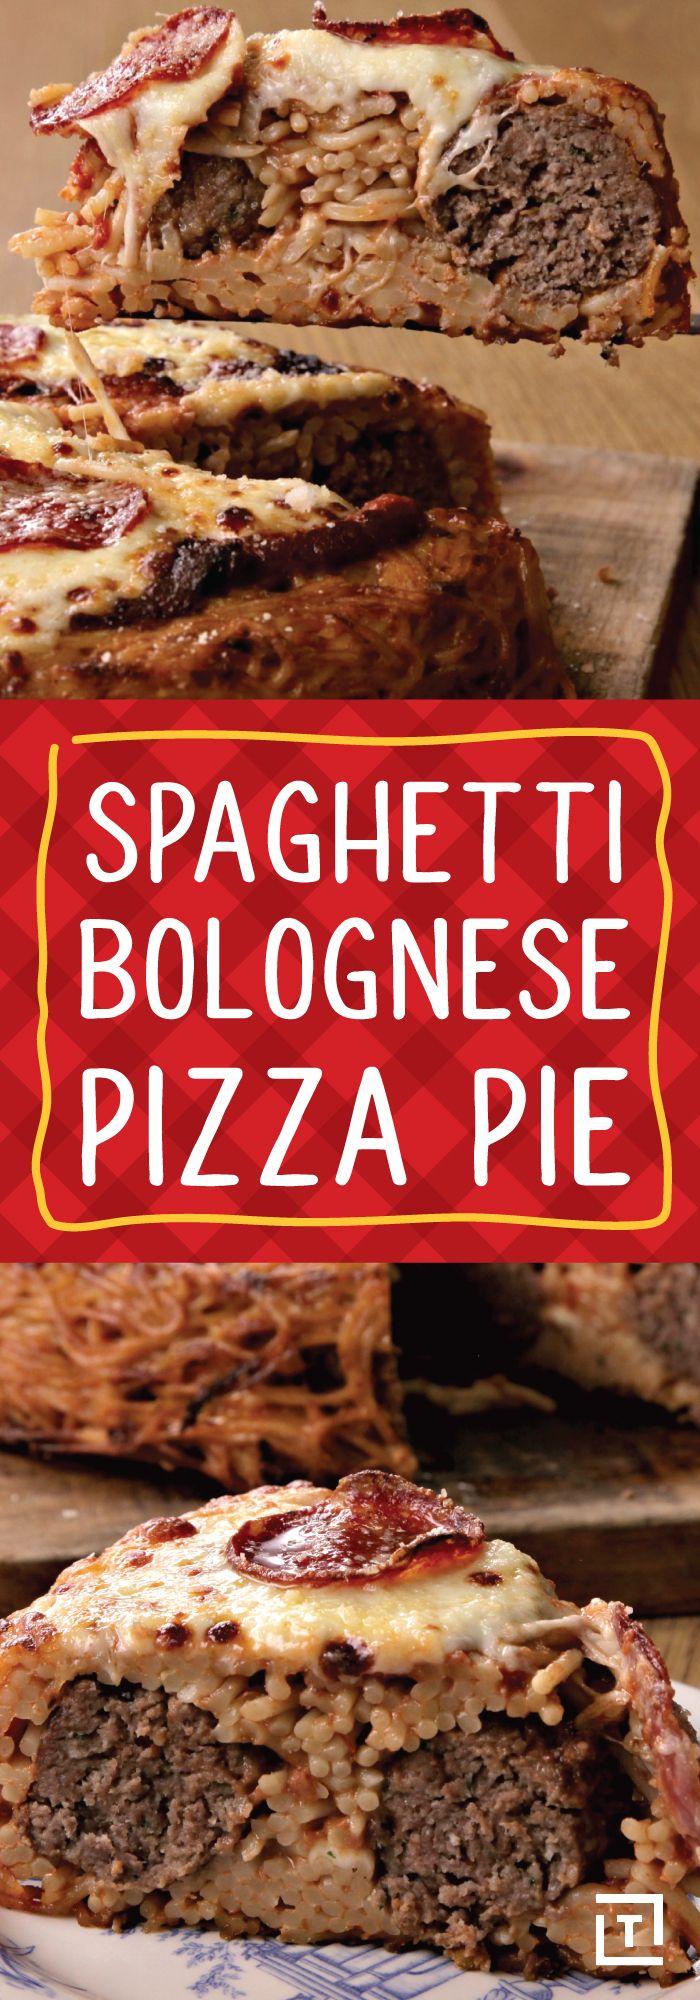 Blue apron bolognese - Spaghetti Bolognese Pizza Pie